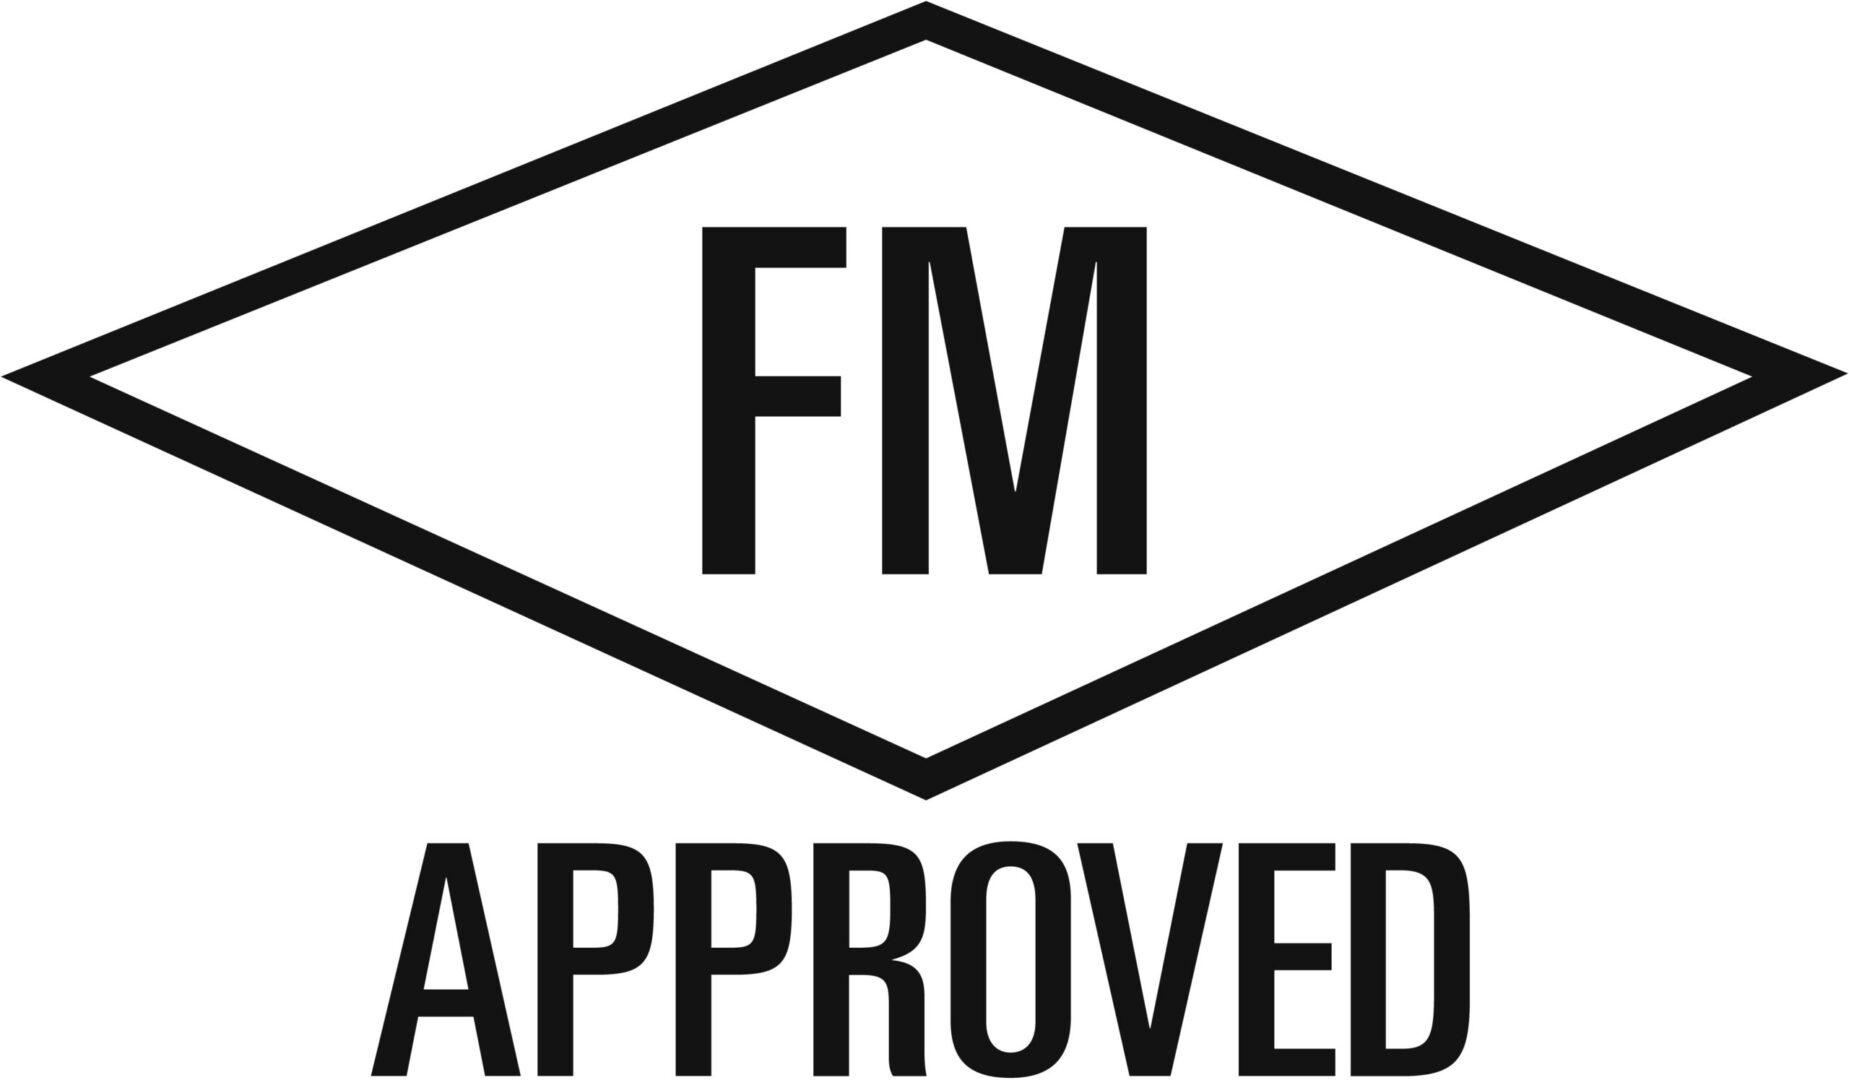 fm-approved-vector-logo